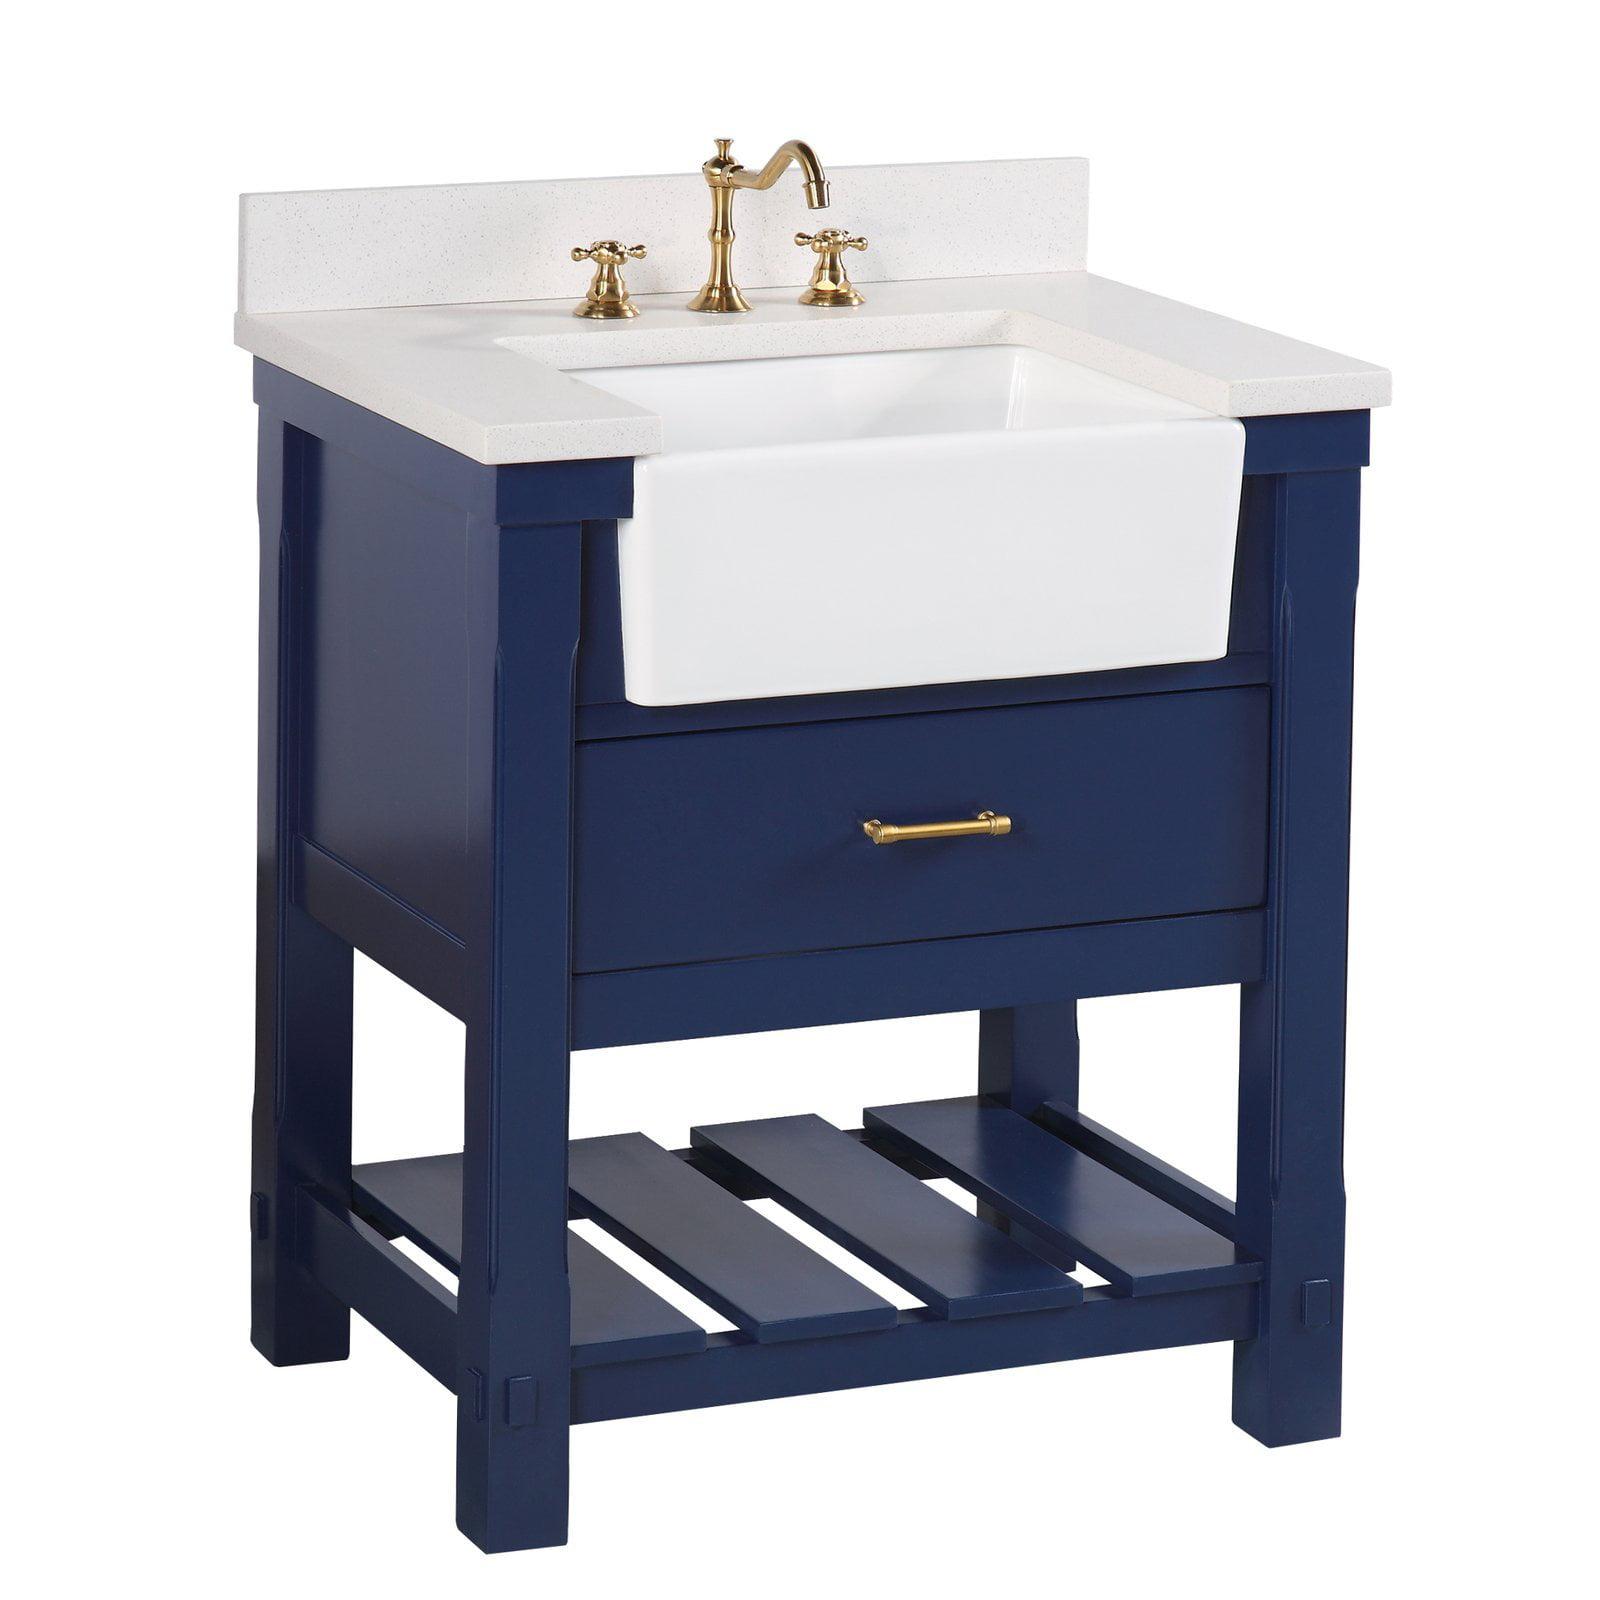 "Charlotte 30"" Royal Blue Farmhouse Bathroom Vanity with ..."